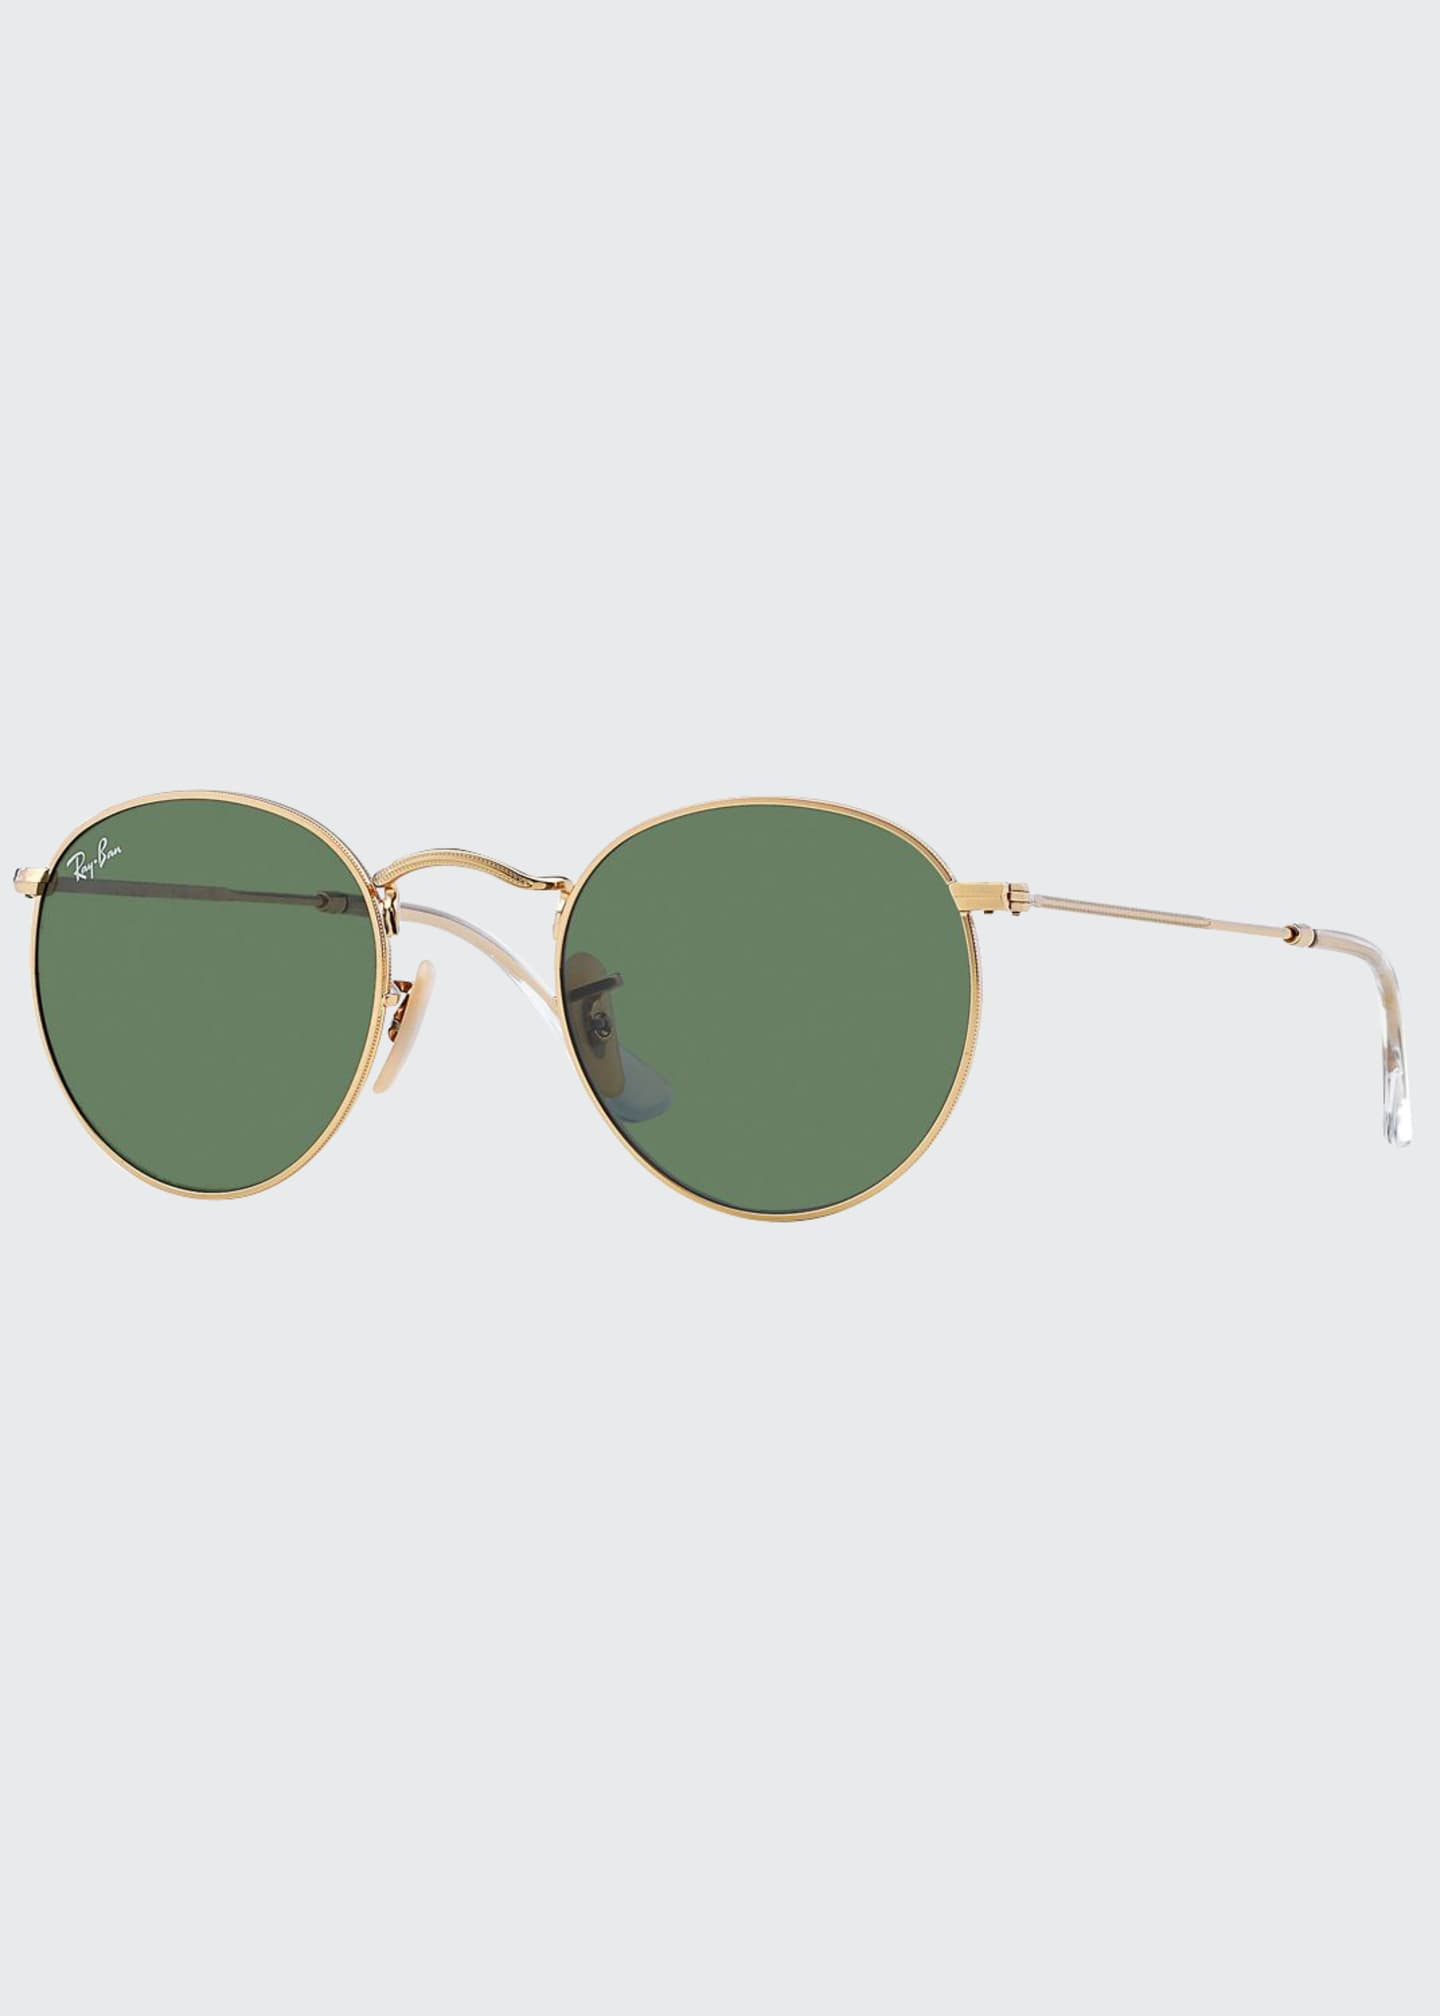 Ray-Ban Men's Round Metal Sunglasses, Green